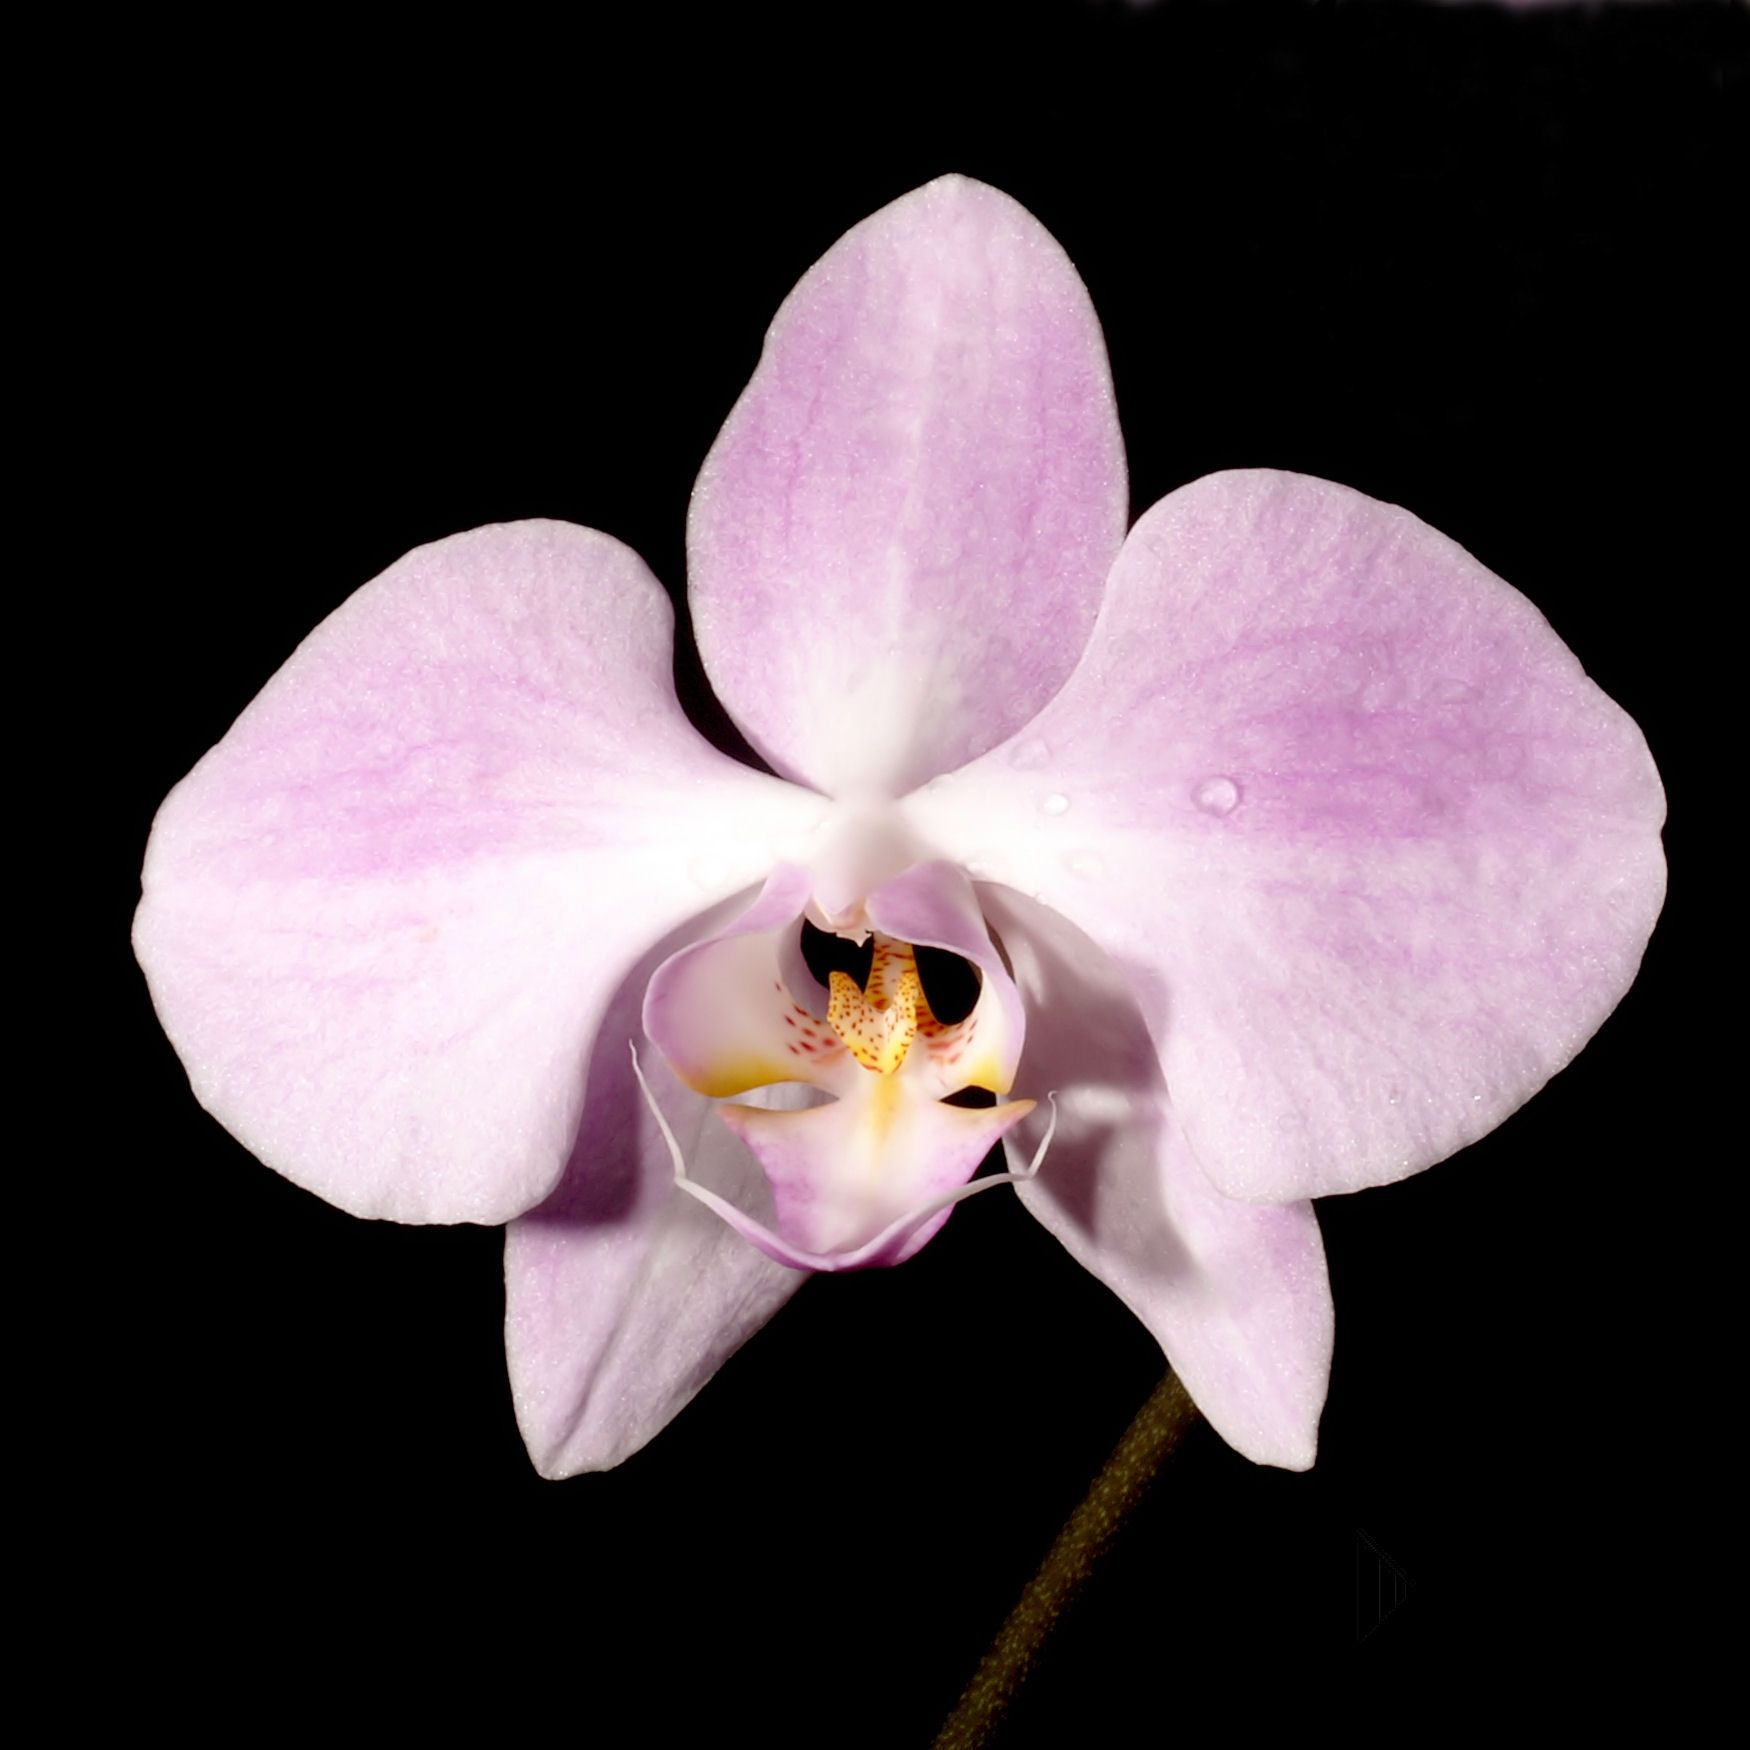 Phalaenopsis_sanderiana_Orchi_9914.jpg (1750×1750)